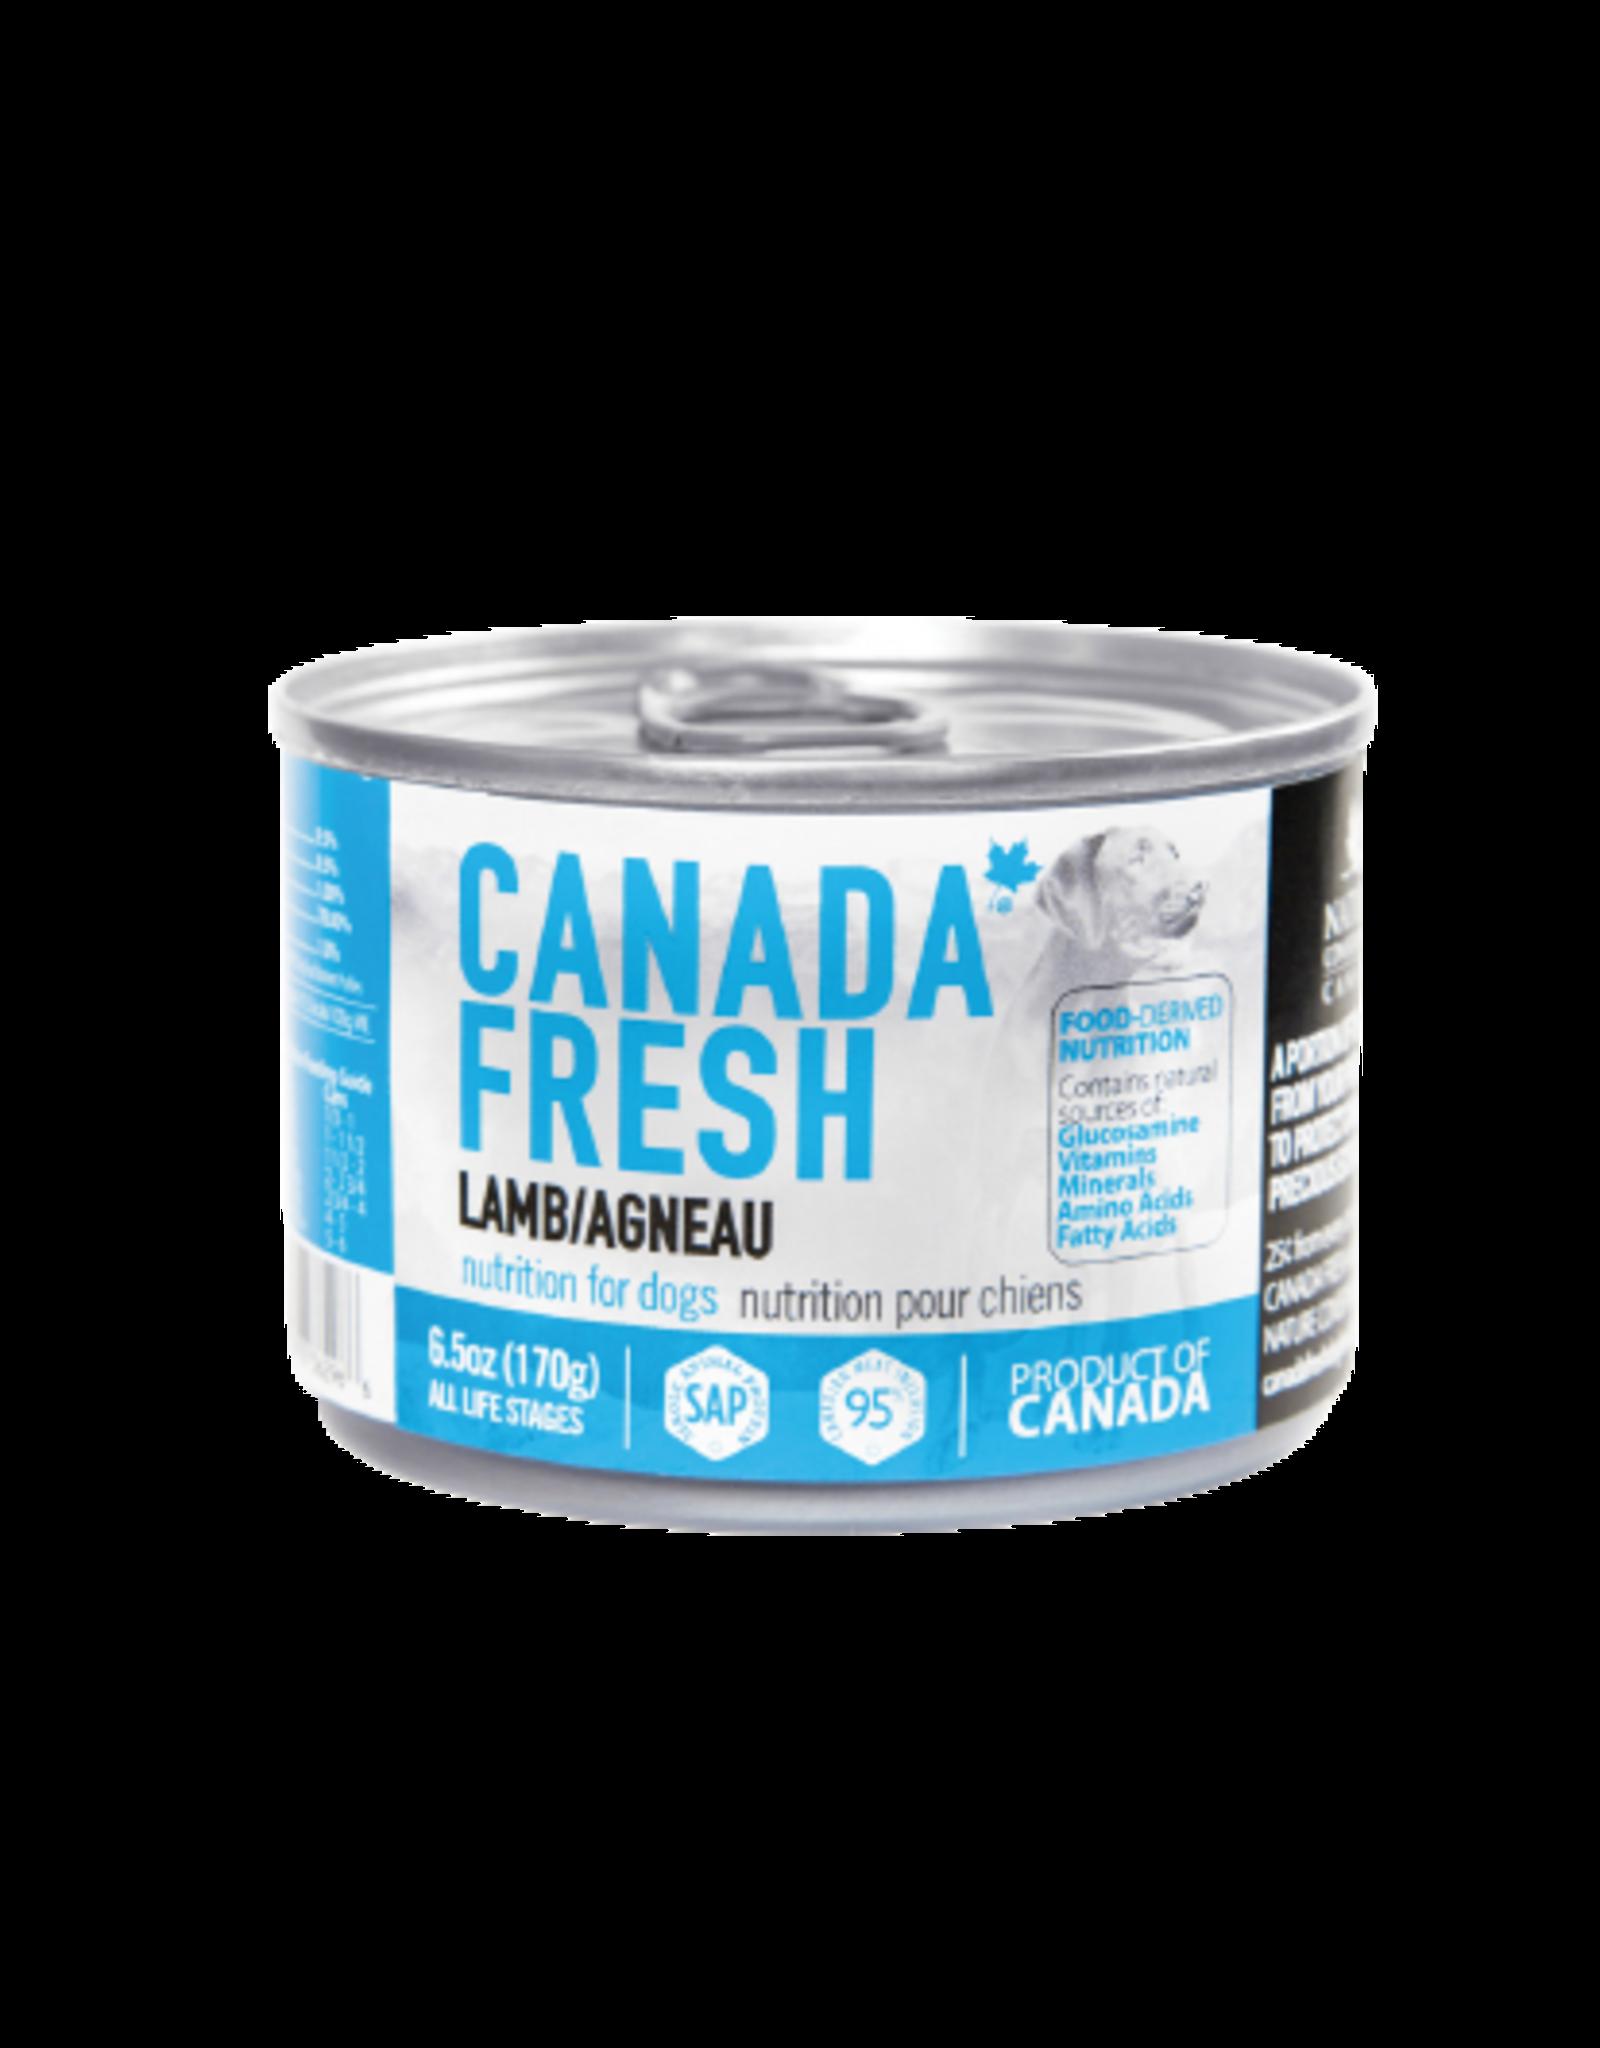 PETKIND CanadaFresh DOG Lamb 6.5oz